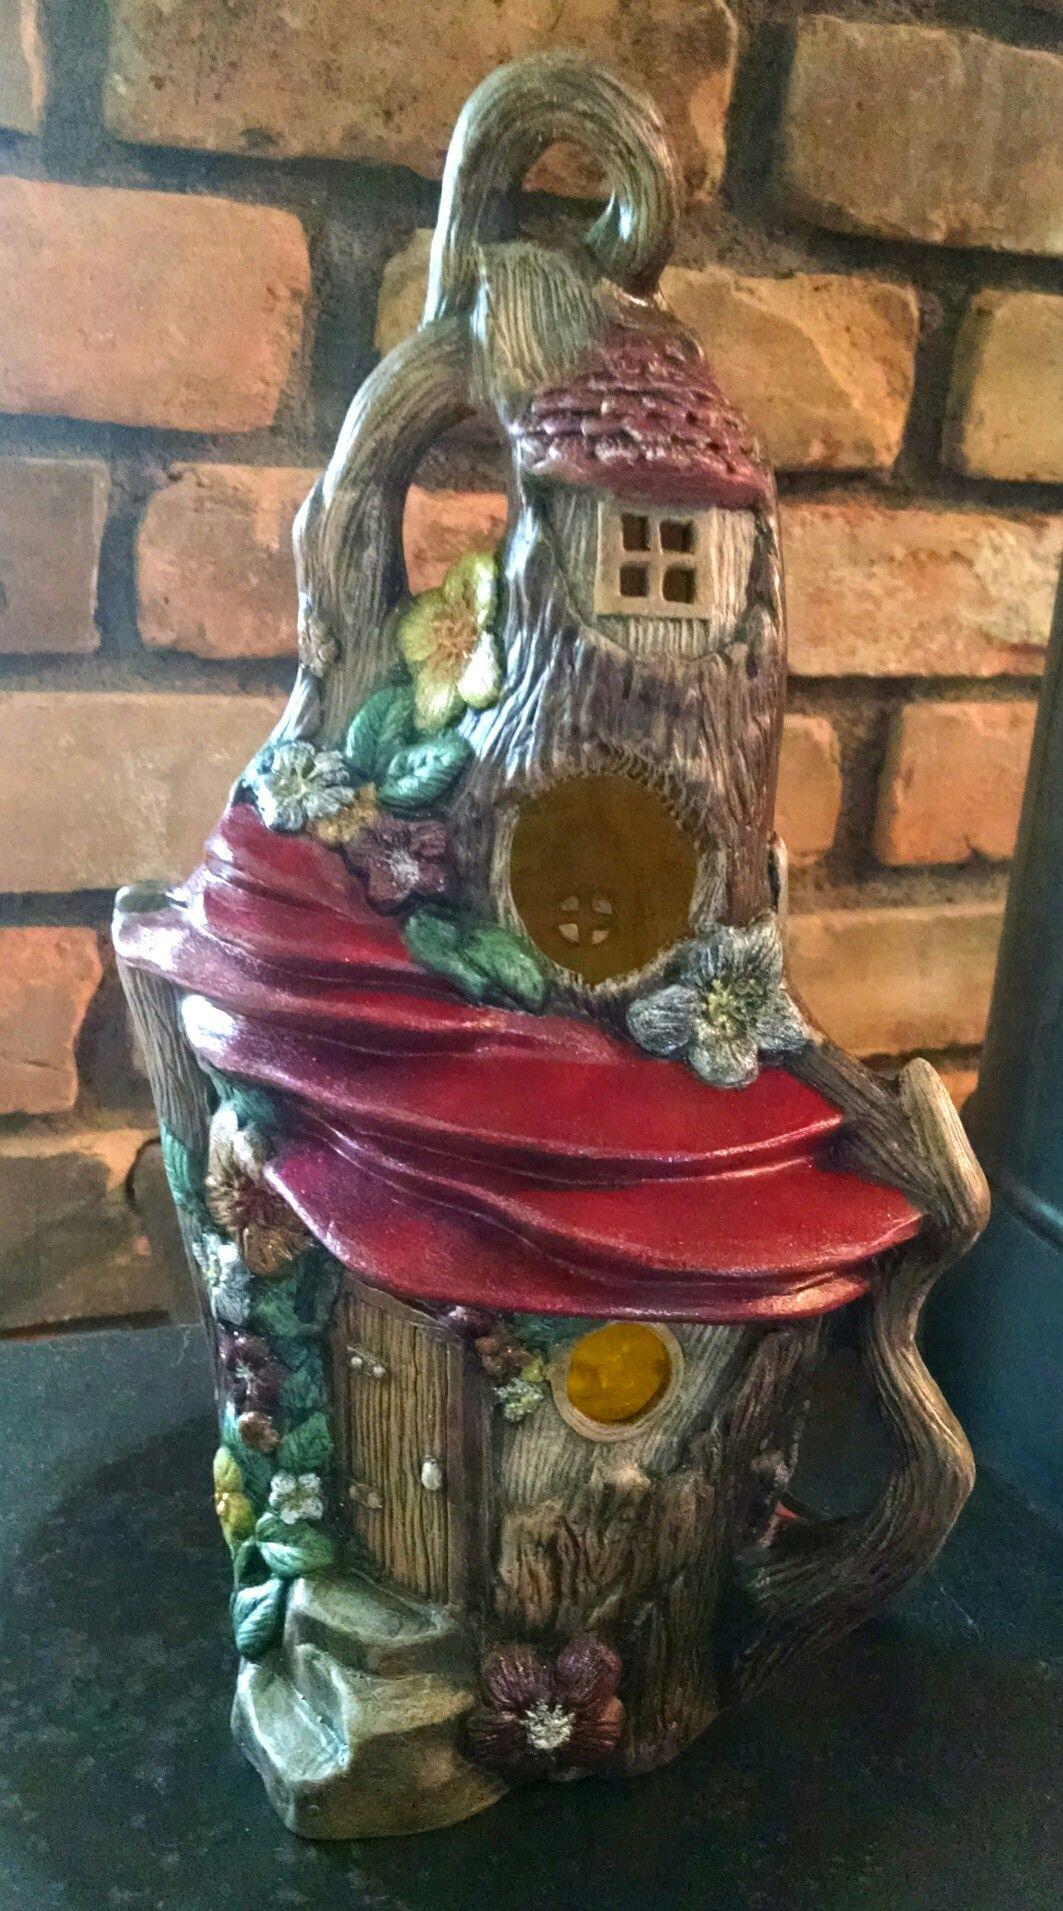 Hand painted ceramic tree stump fairy house my work